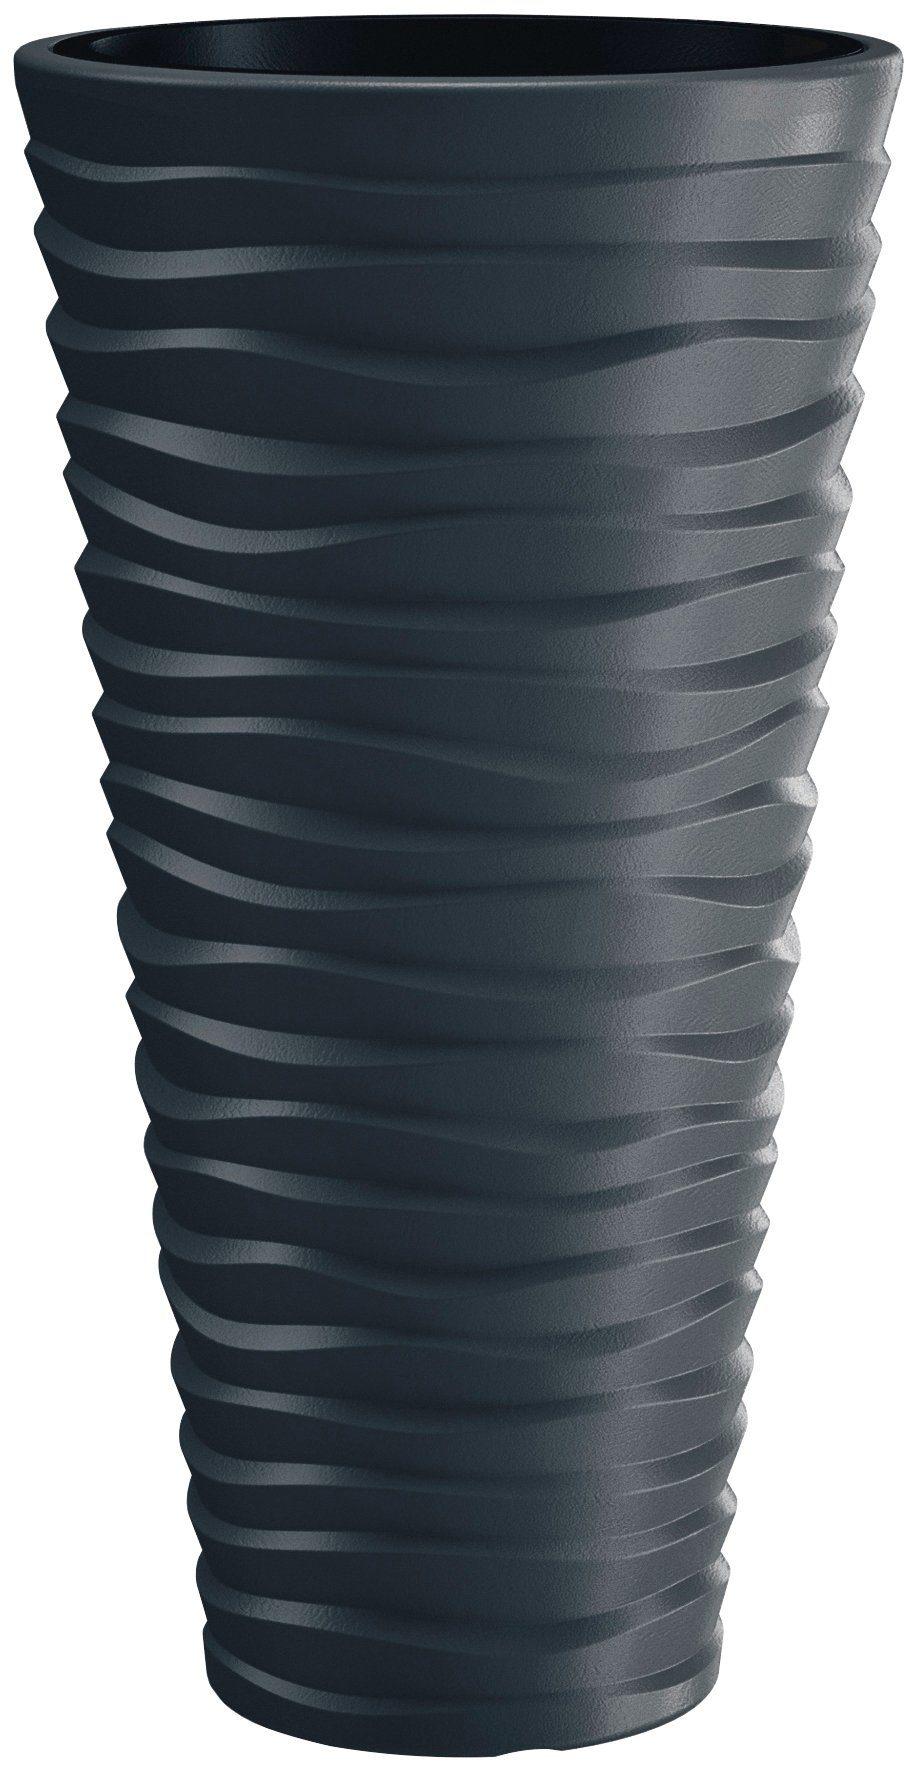 PROSPERPLAST Pflanzkübel »Sand slim«, ØxHöhe: 39x75 cm, anthrazit